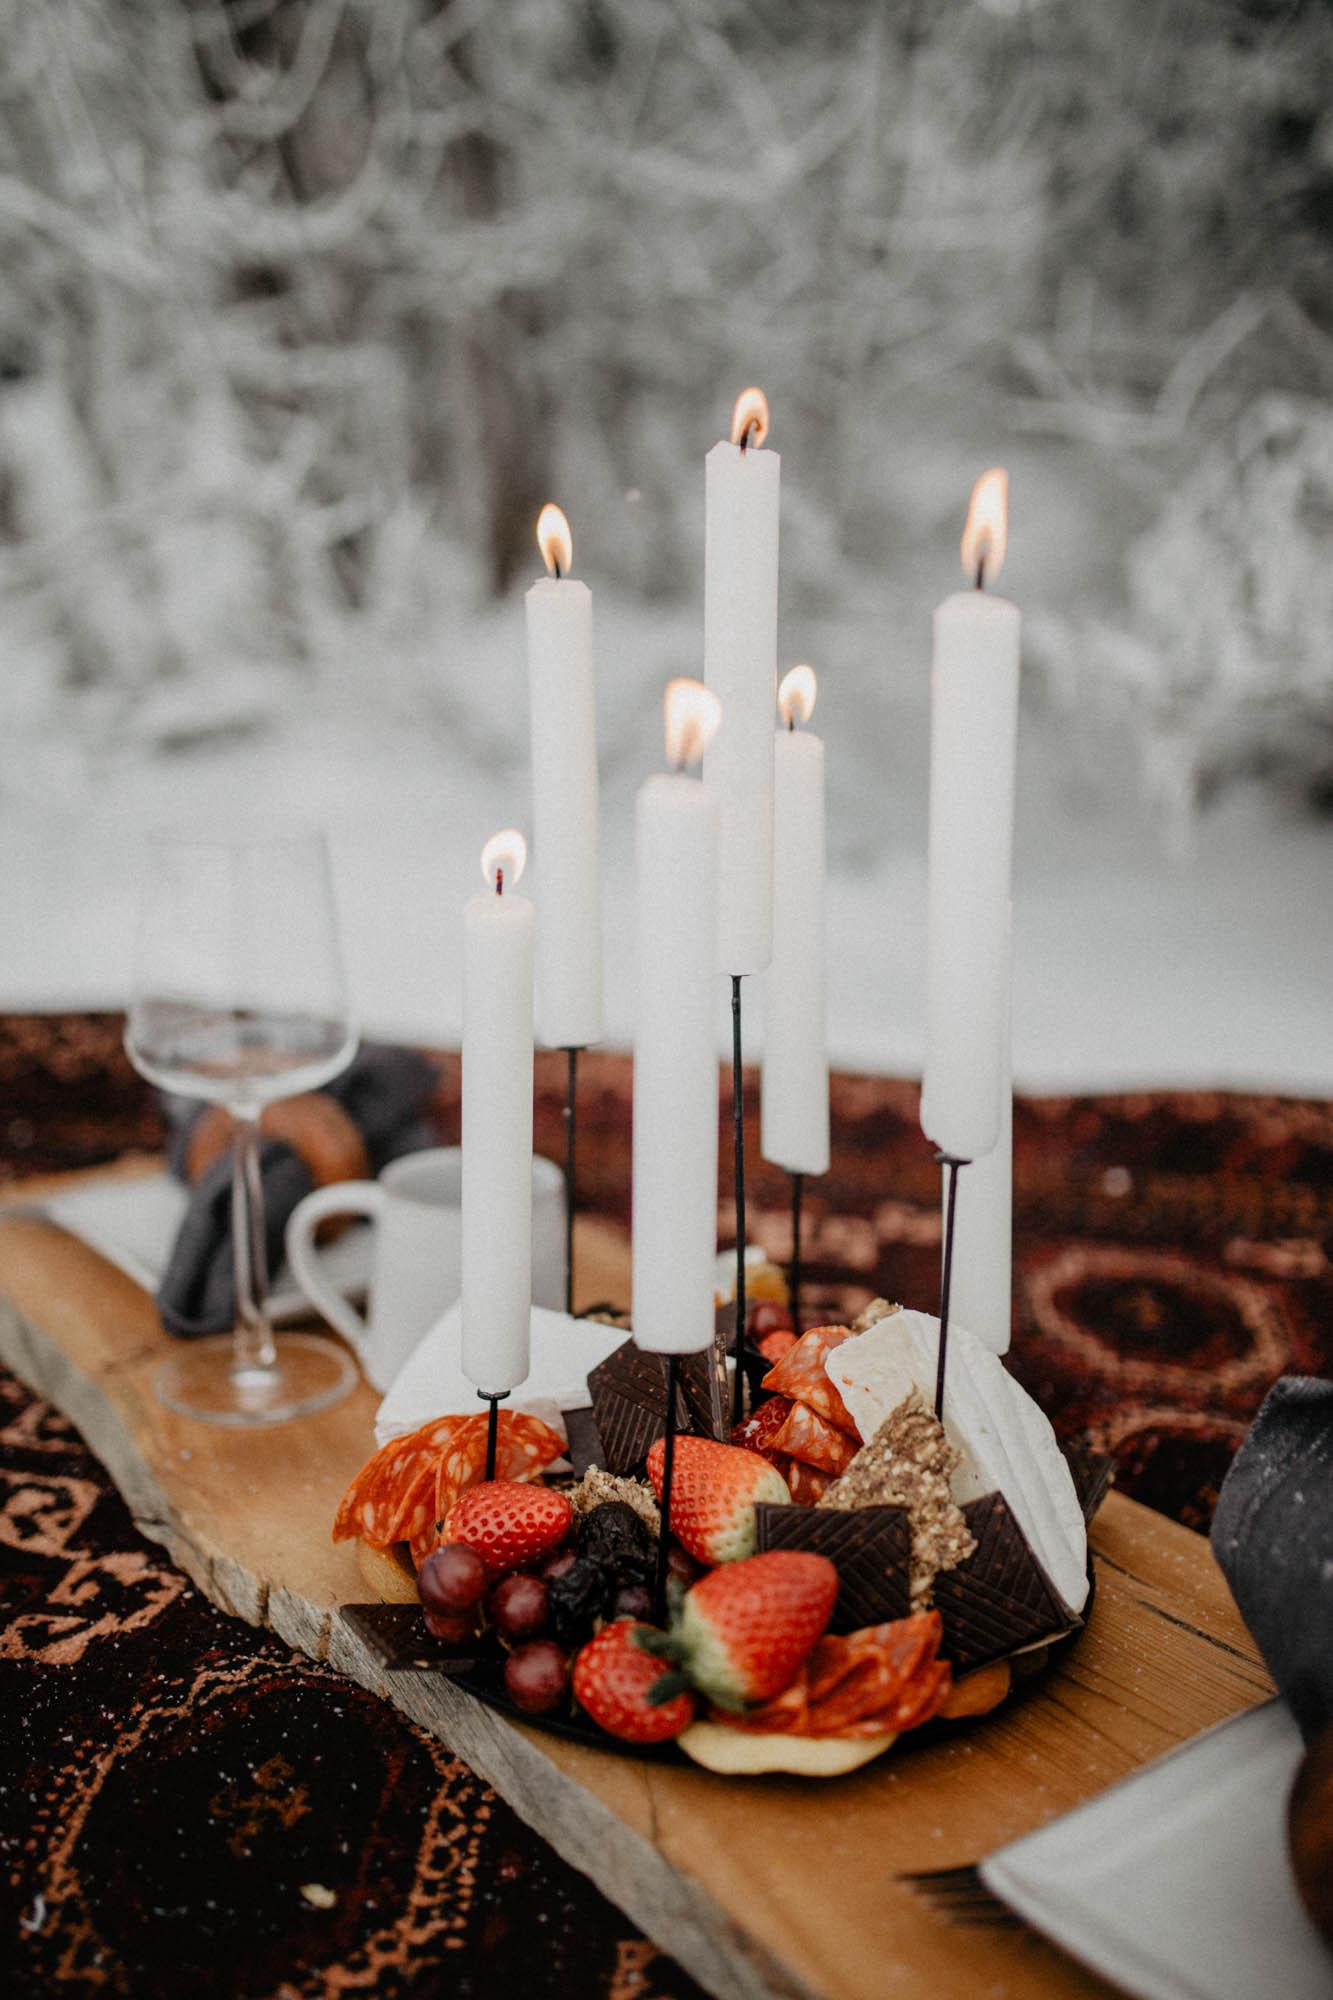 ashley_schulman_photography-winter_wedding_tampere-3.jpg